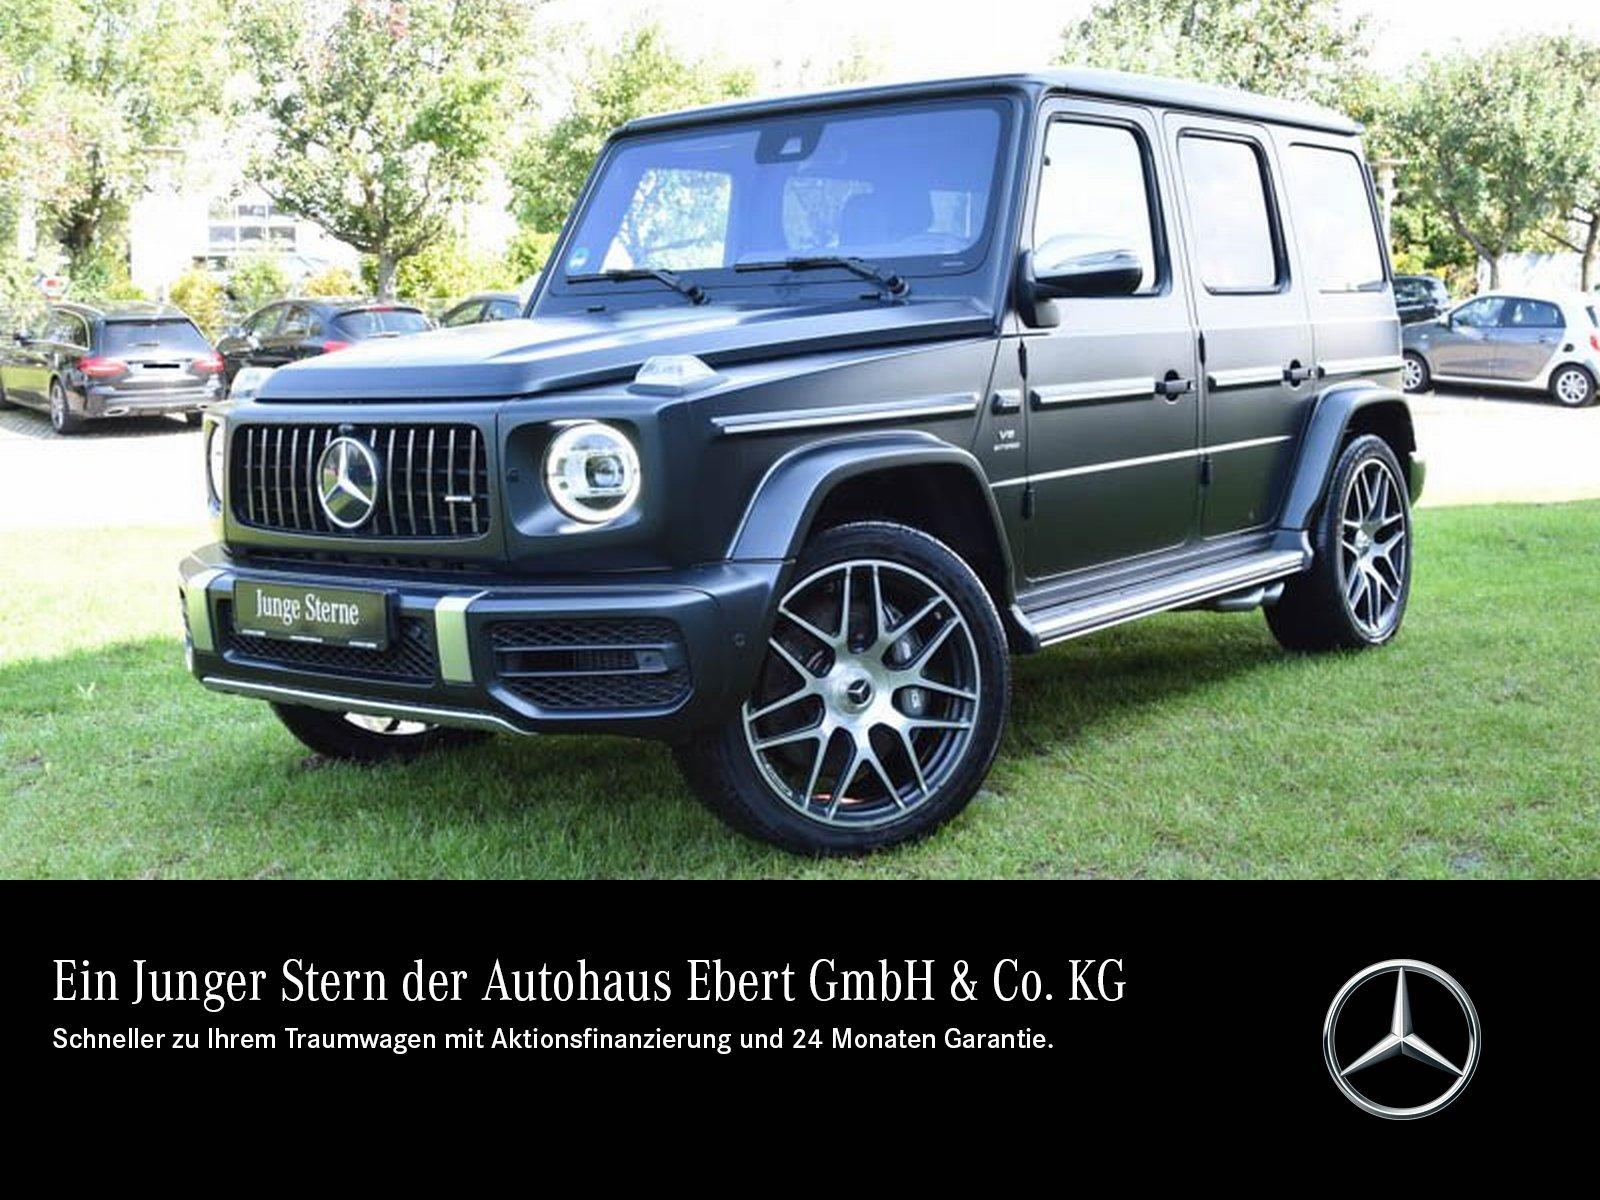 Mercedes-Benz G 63 AMG STRONGER THAN TIME DRIVER'S+360+AHK+LED, Jahr 2019, Benzin